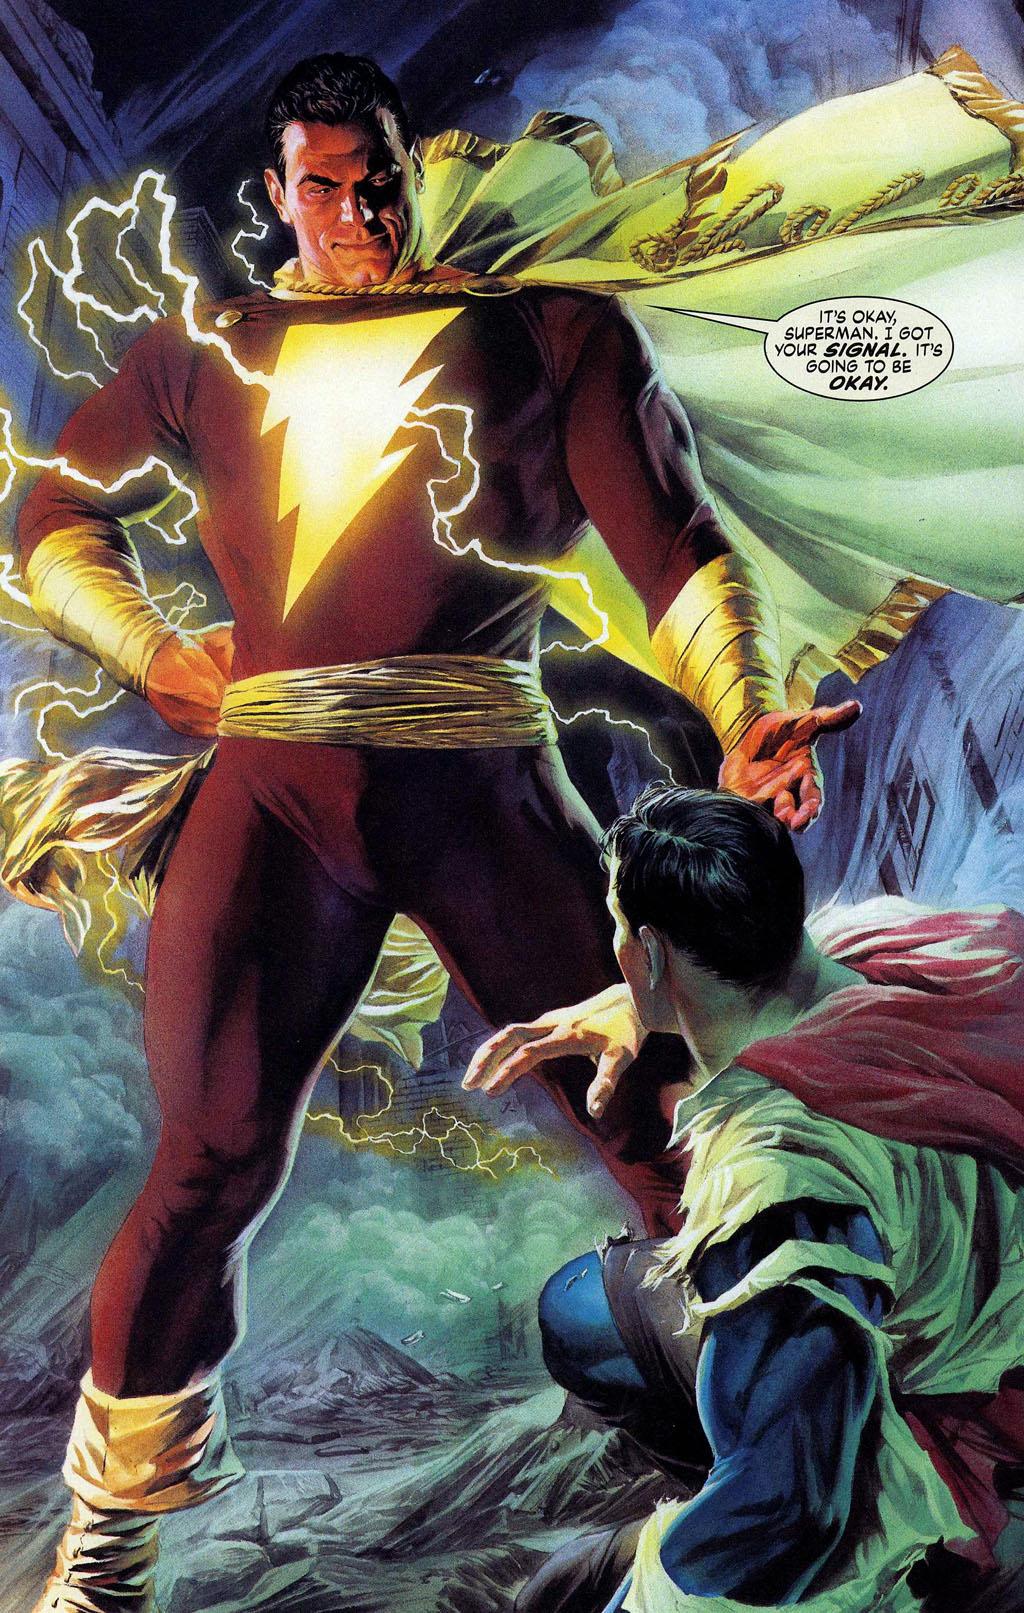 Superman Shazam!: The Return Of Black Adam Backgrounds, Compatible - PC, Mobile, Gadgets| 1024x1613 px